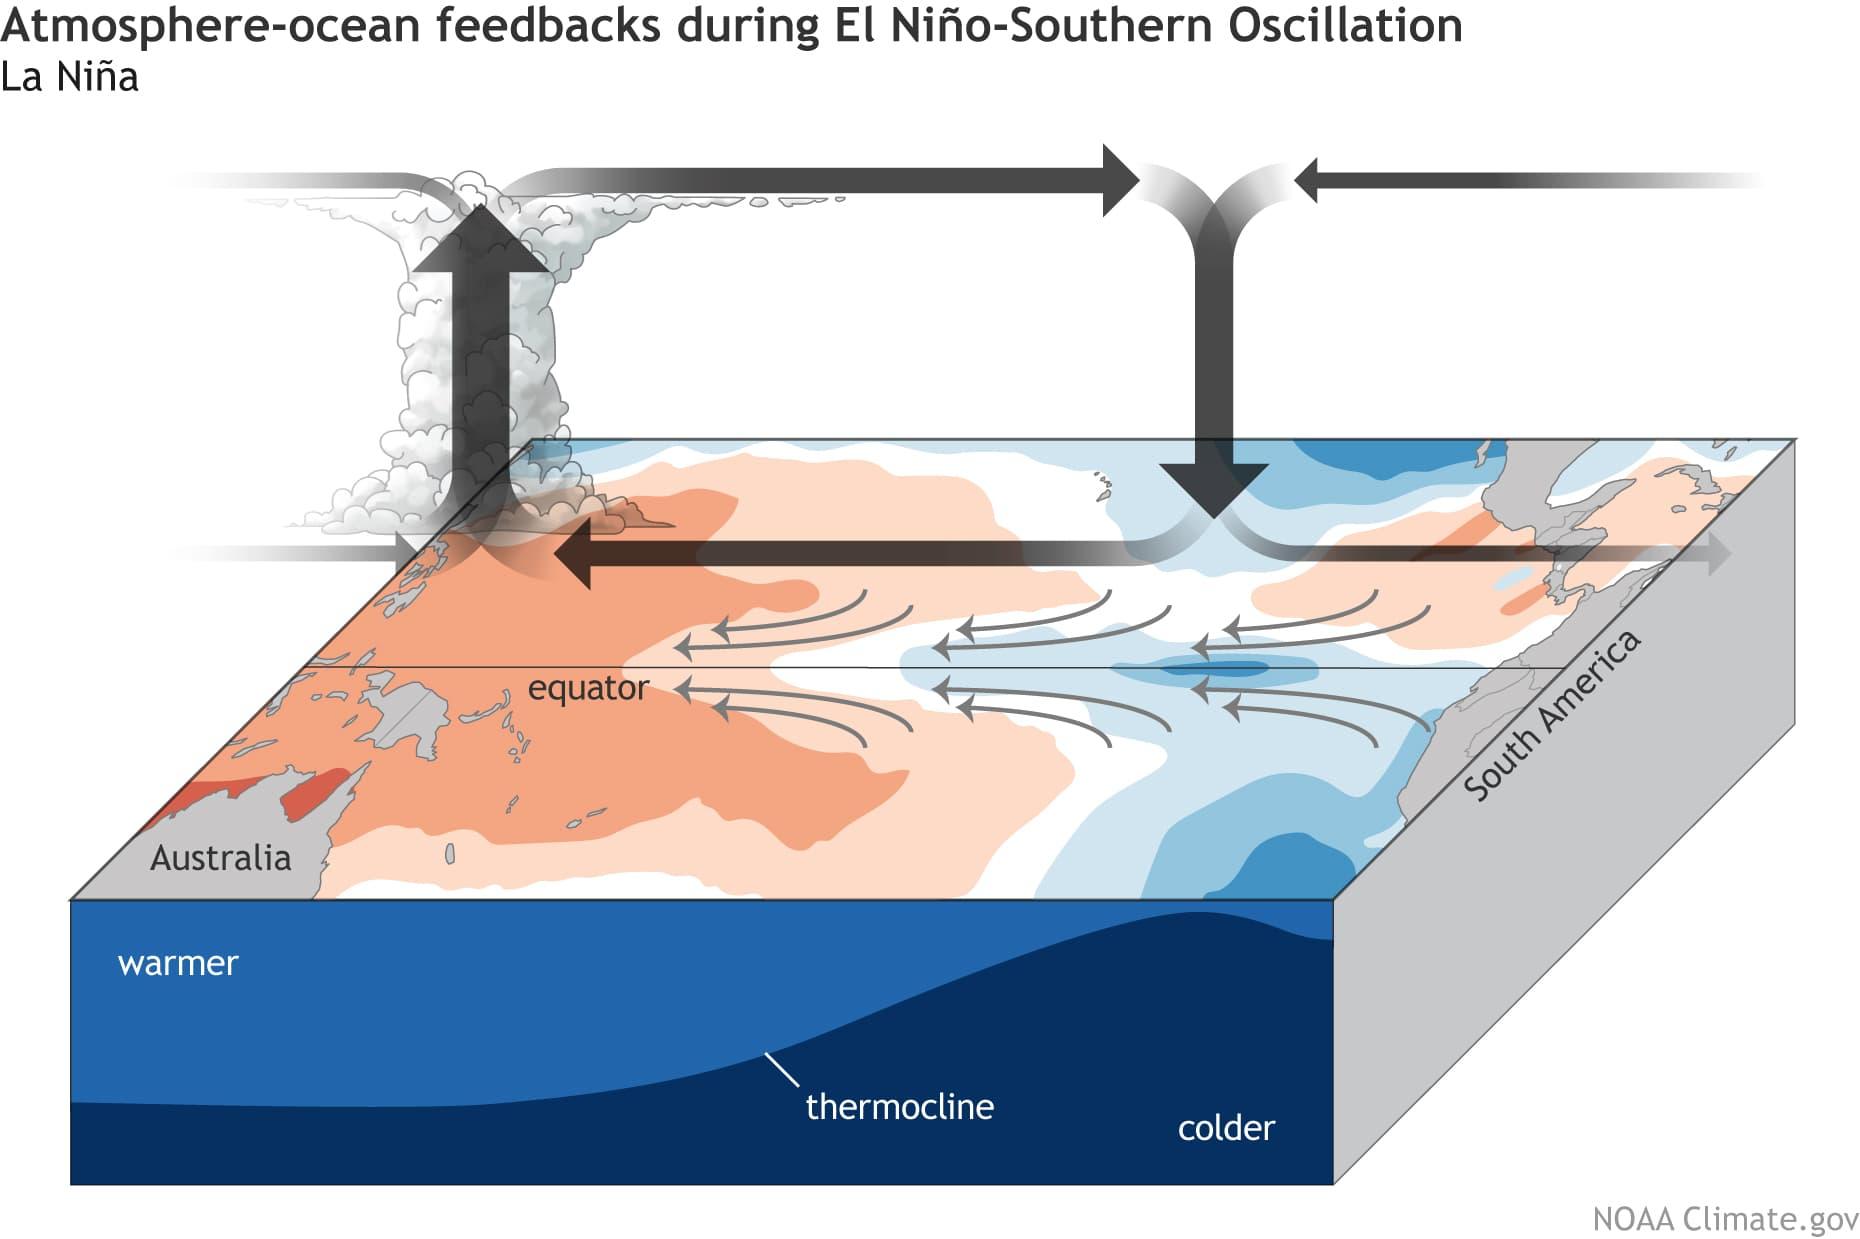 la-nina-enso-circulation-pattern-tropical-pressure